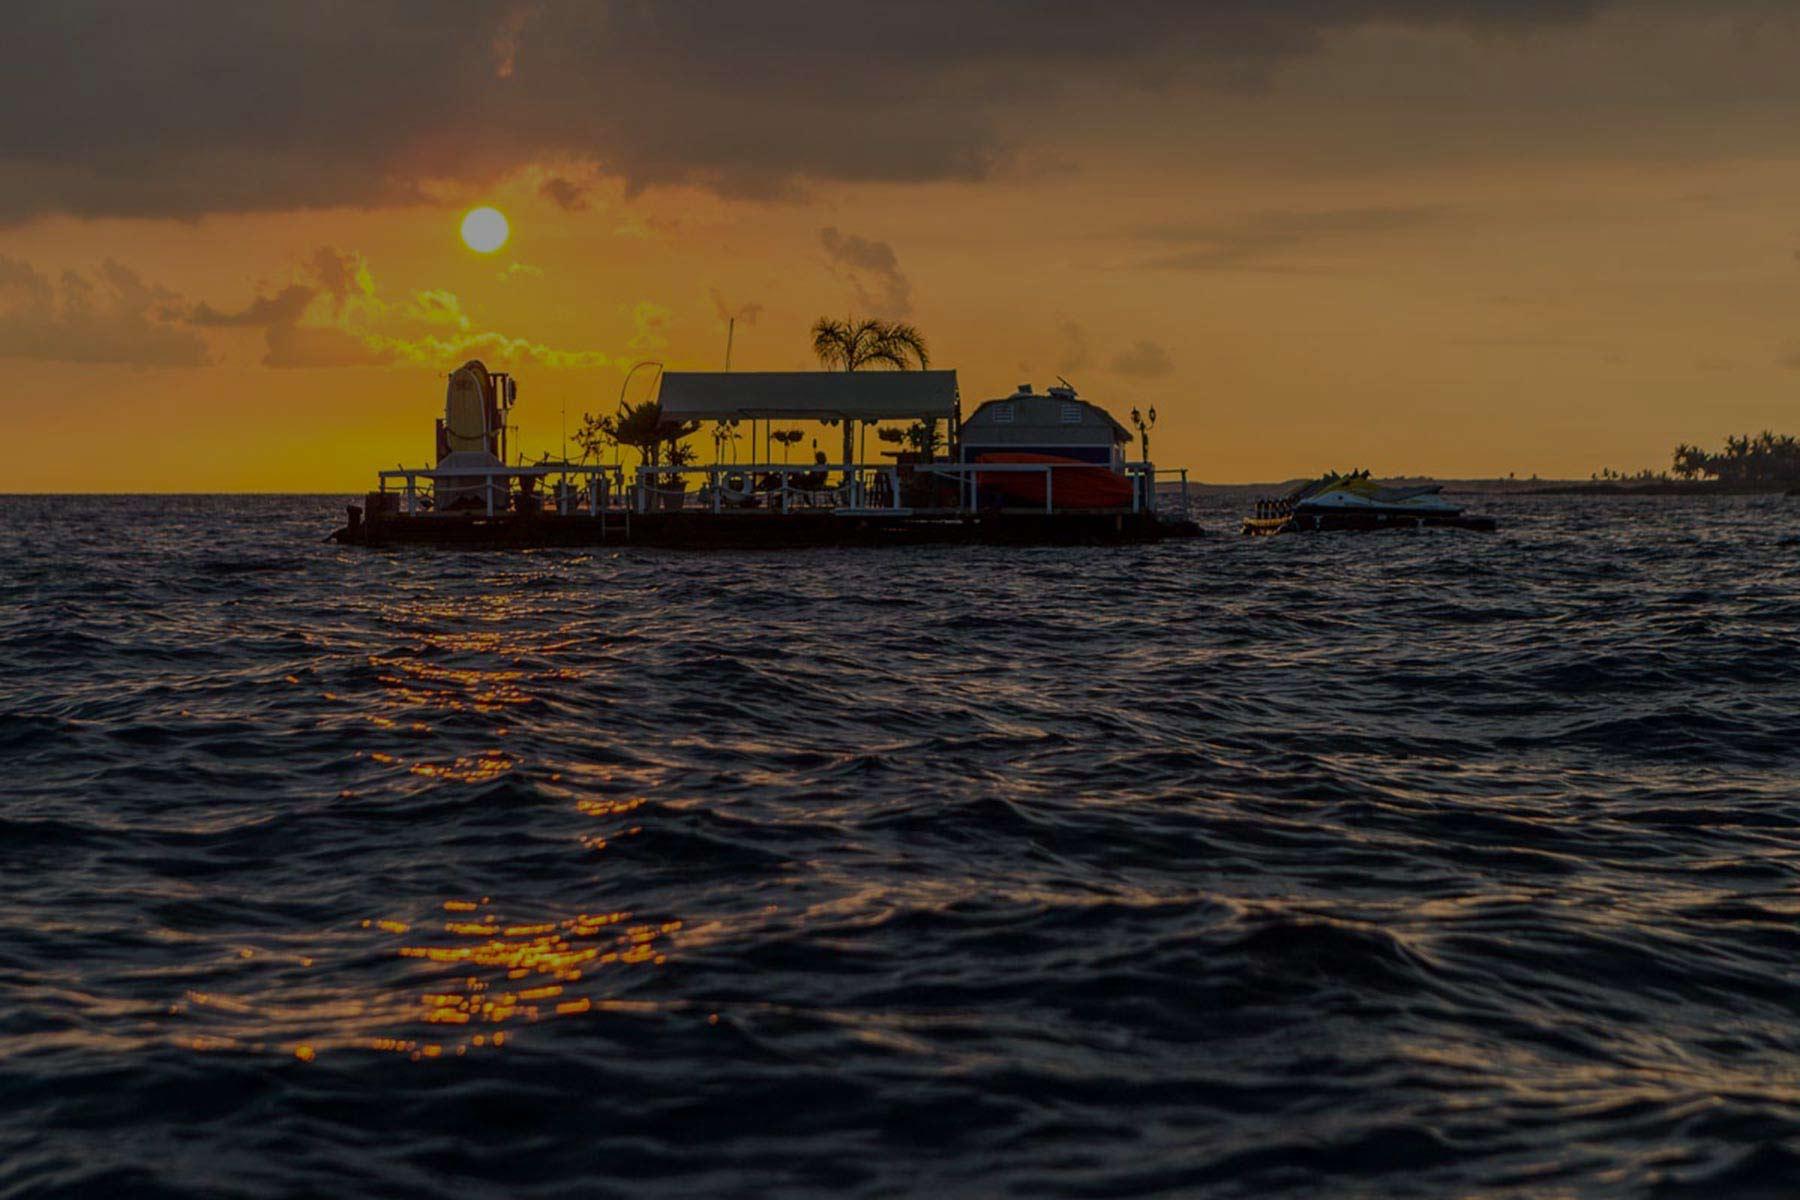 Big Island Divers biw background